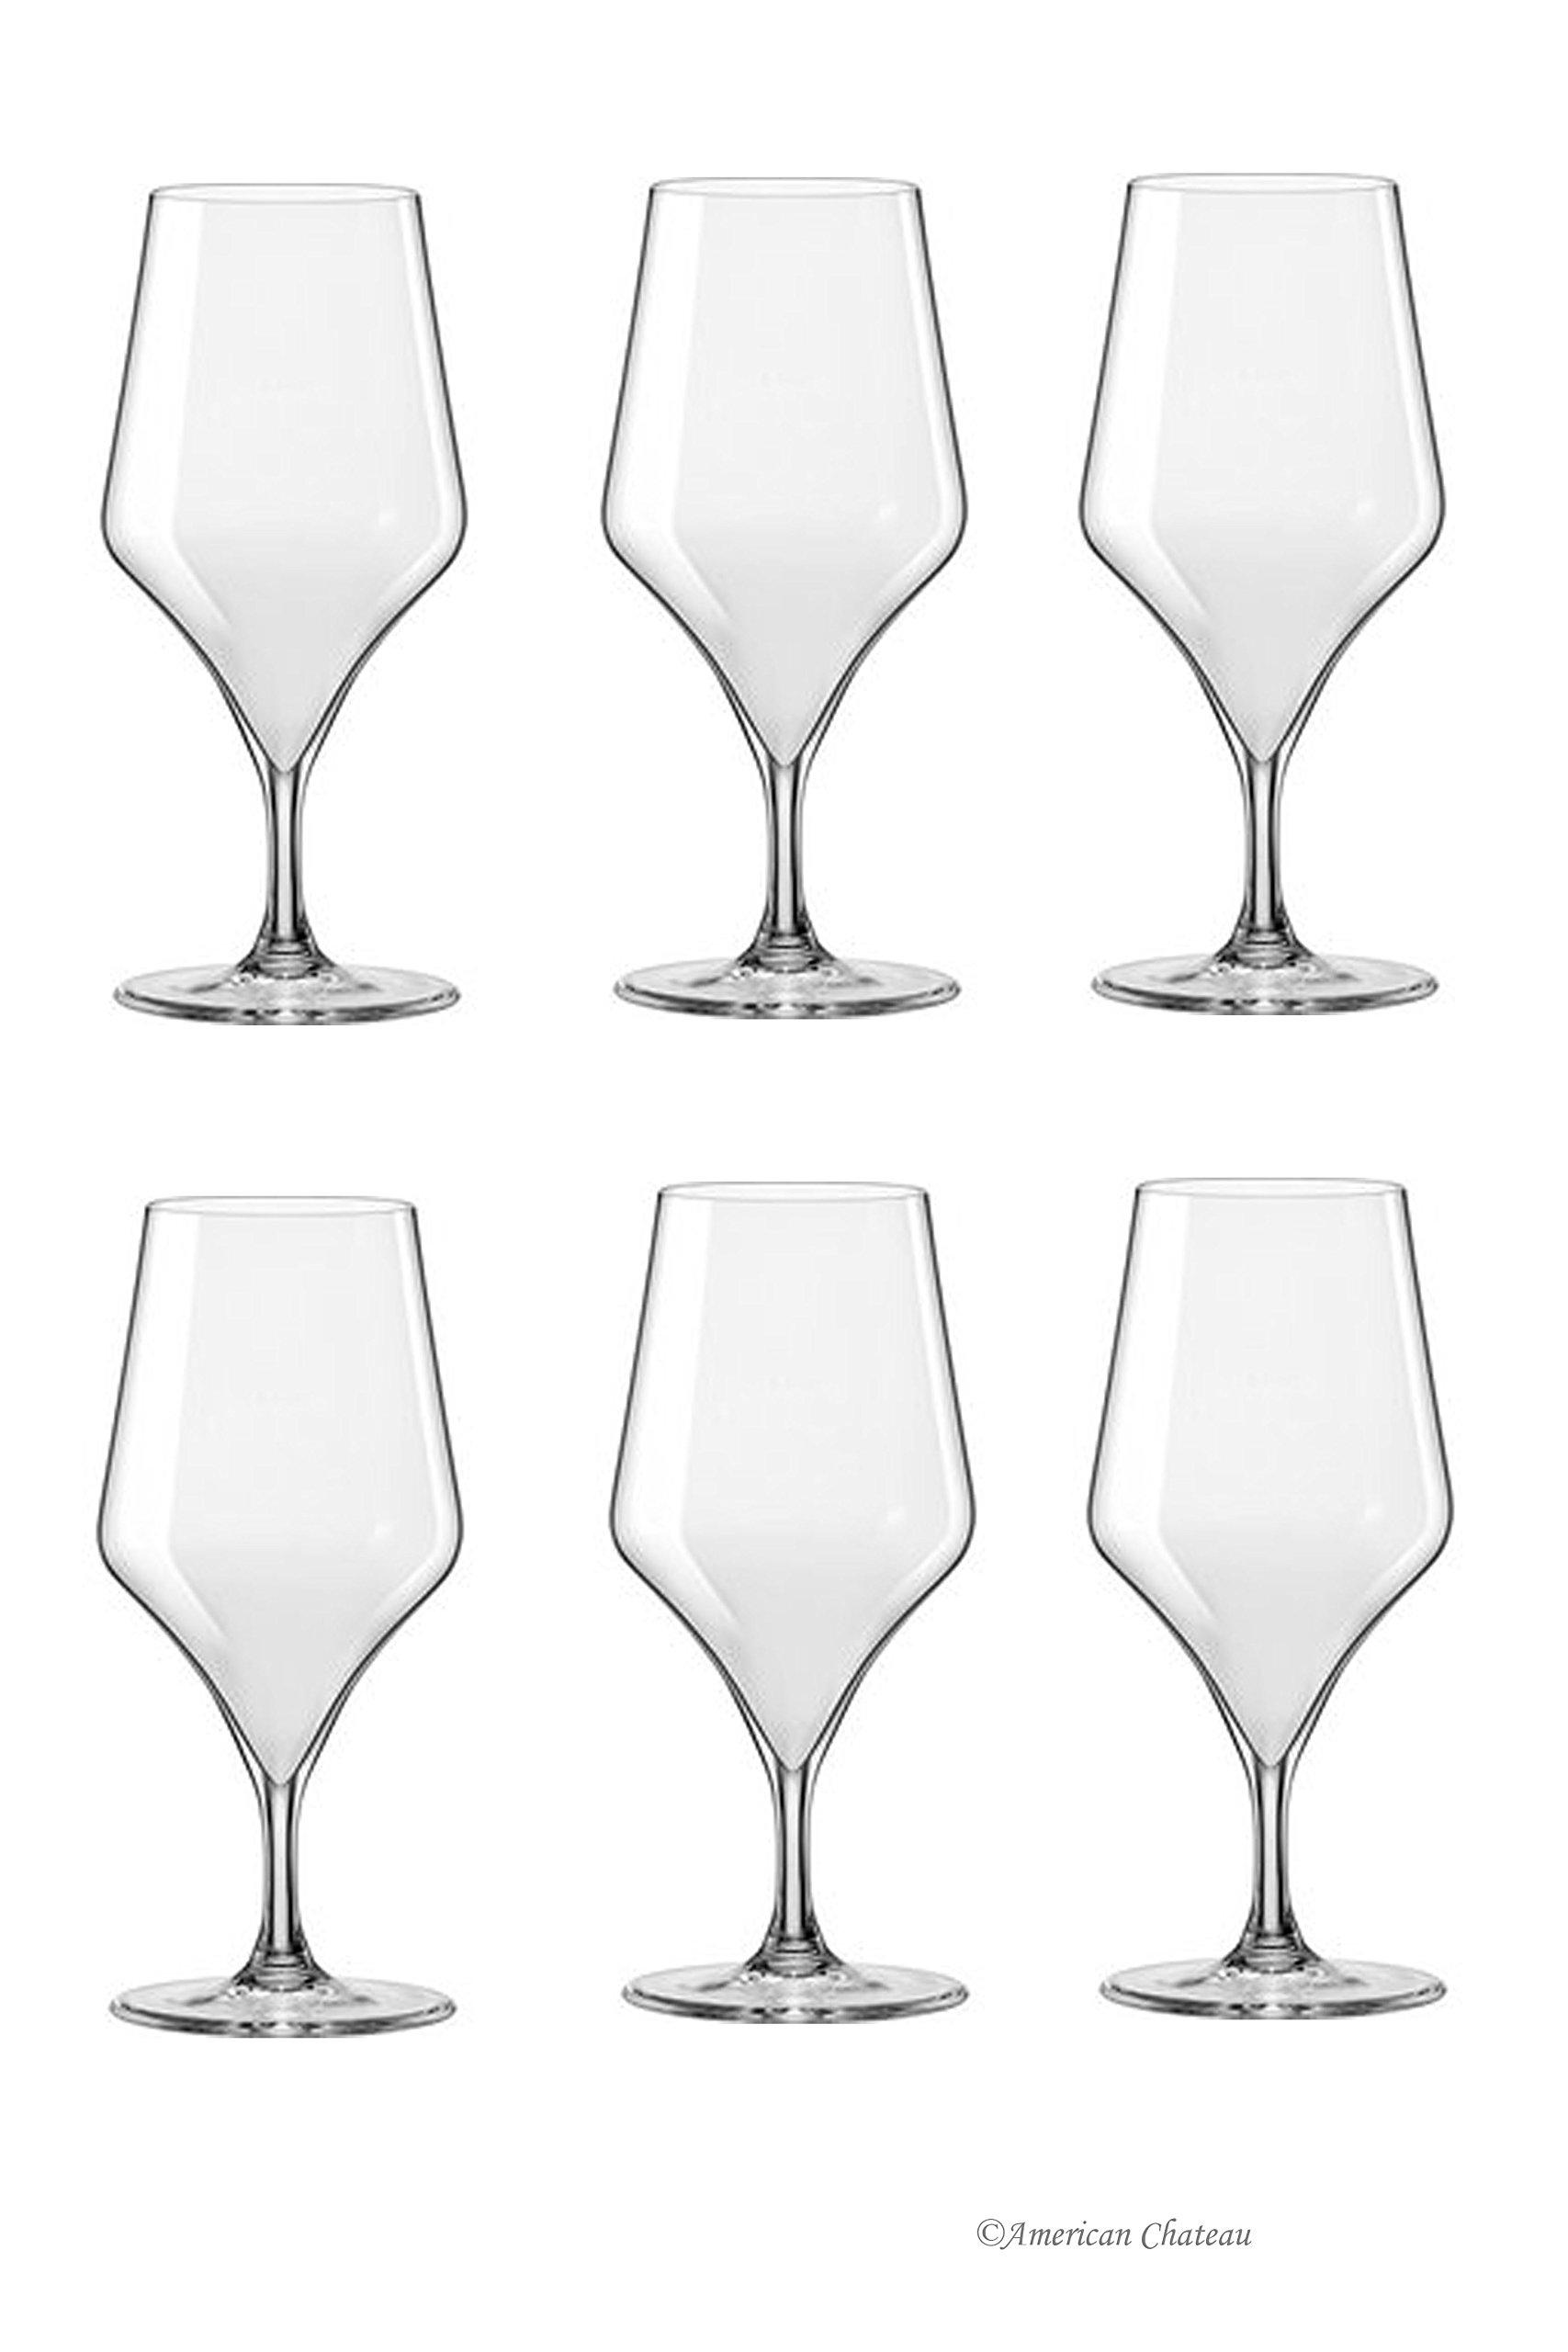 Set of 12 Bohemia Crystal Stem Water/Wine Goblet Glasses